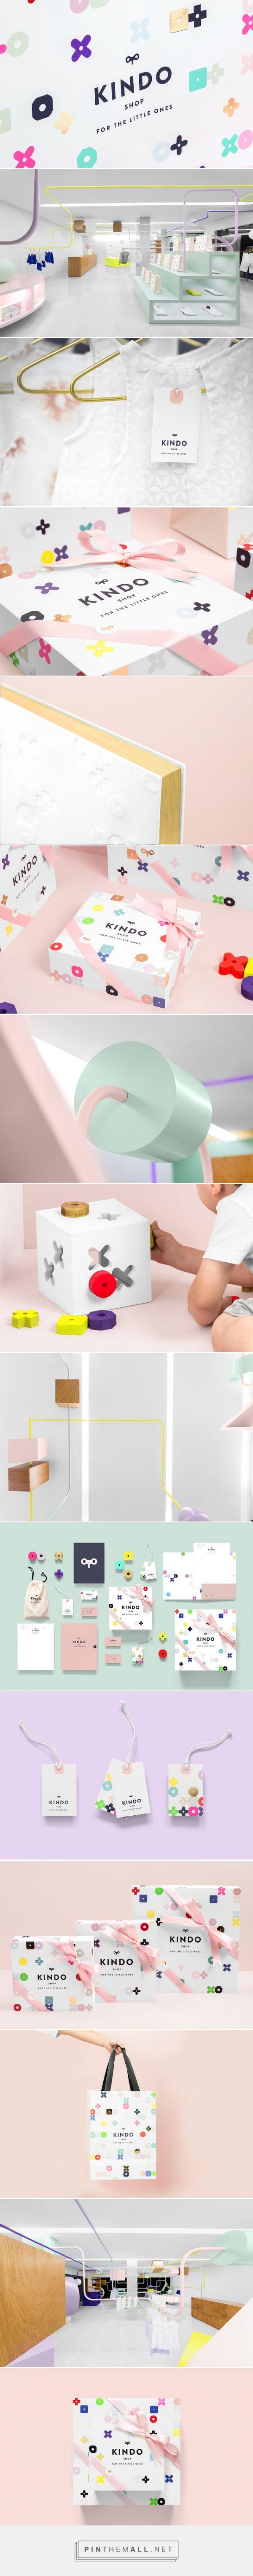 Kindo #Kids #Clothing #packaging designed by Anagrama - http://www.packagingoftheworld.com/2015/07/kindo.html